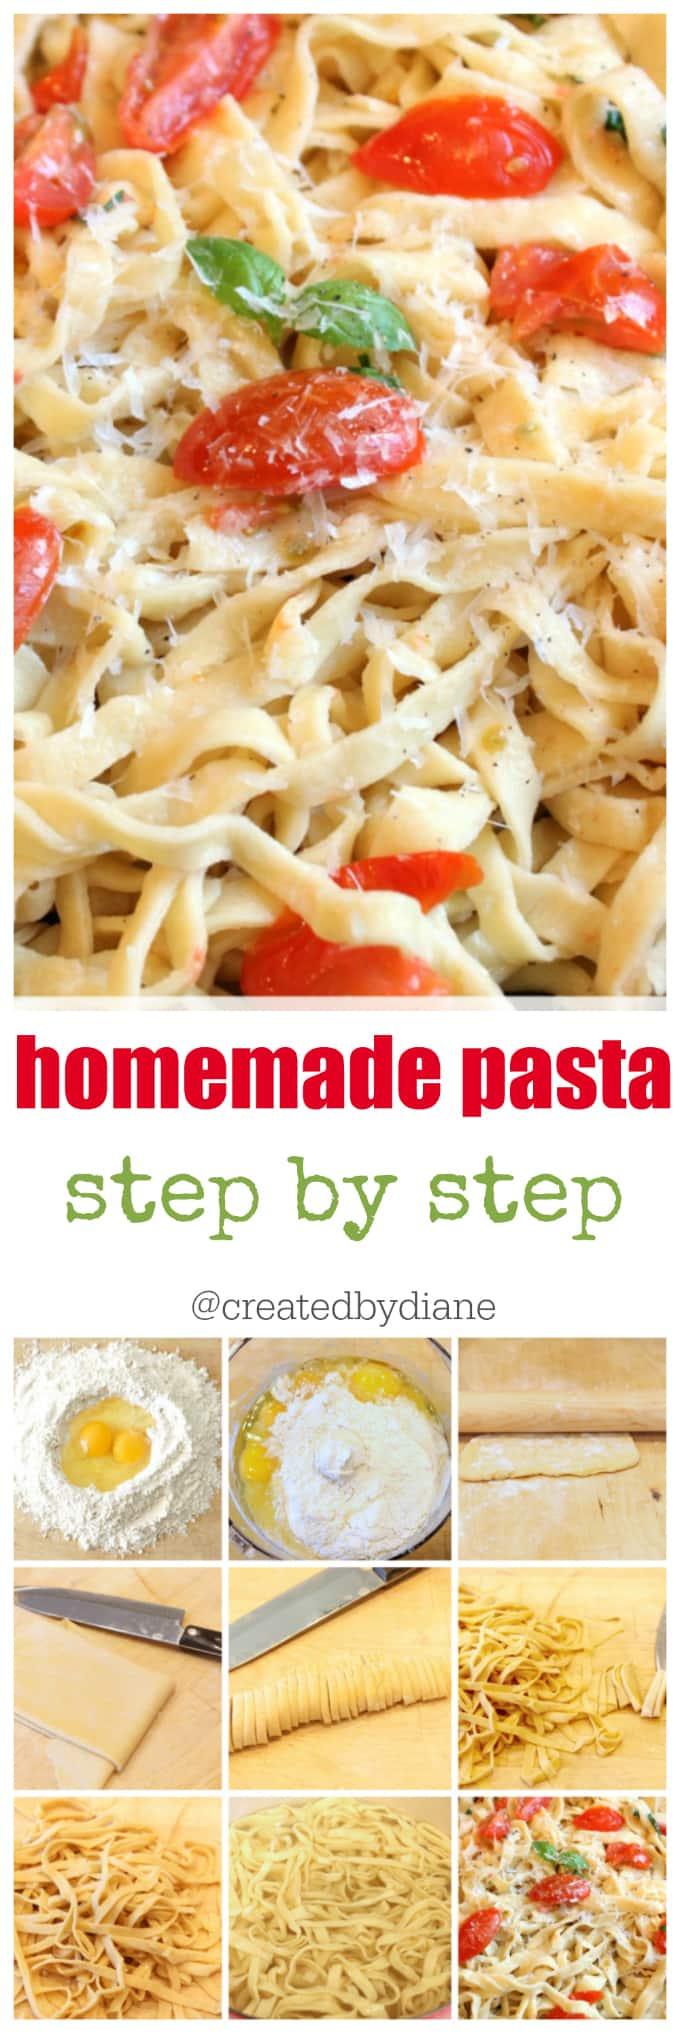 homemade pasta recipe and how to @createdbydiane